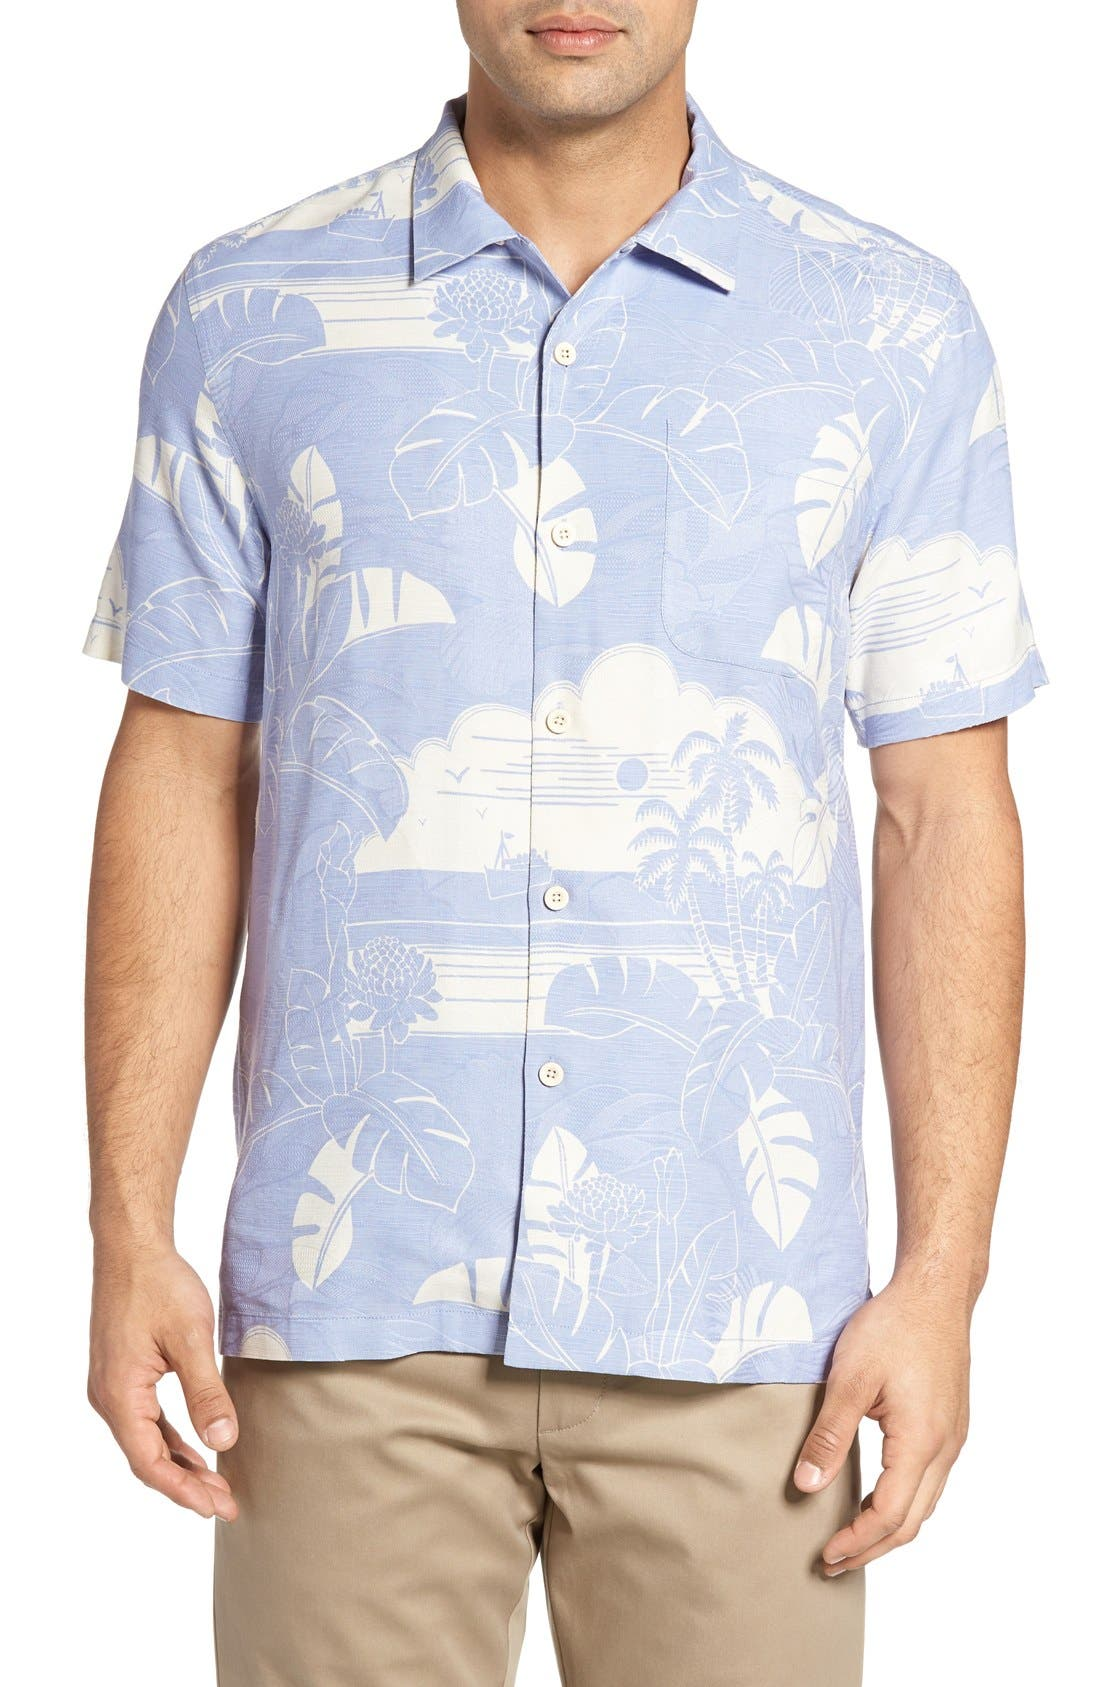 Bon Voyage Isle Silk Shirt,                         Main,                         color, Beachcomber Blue